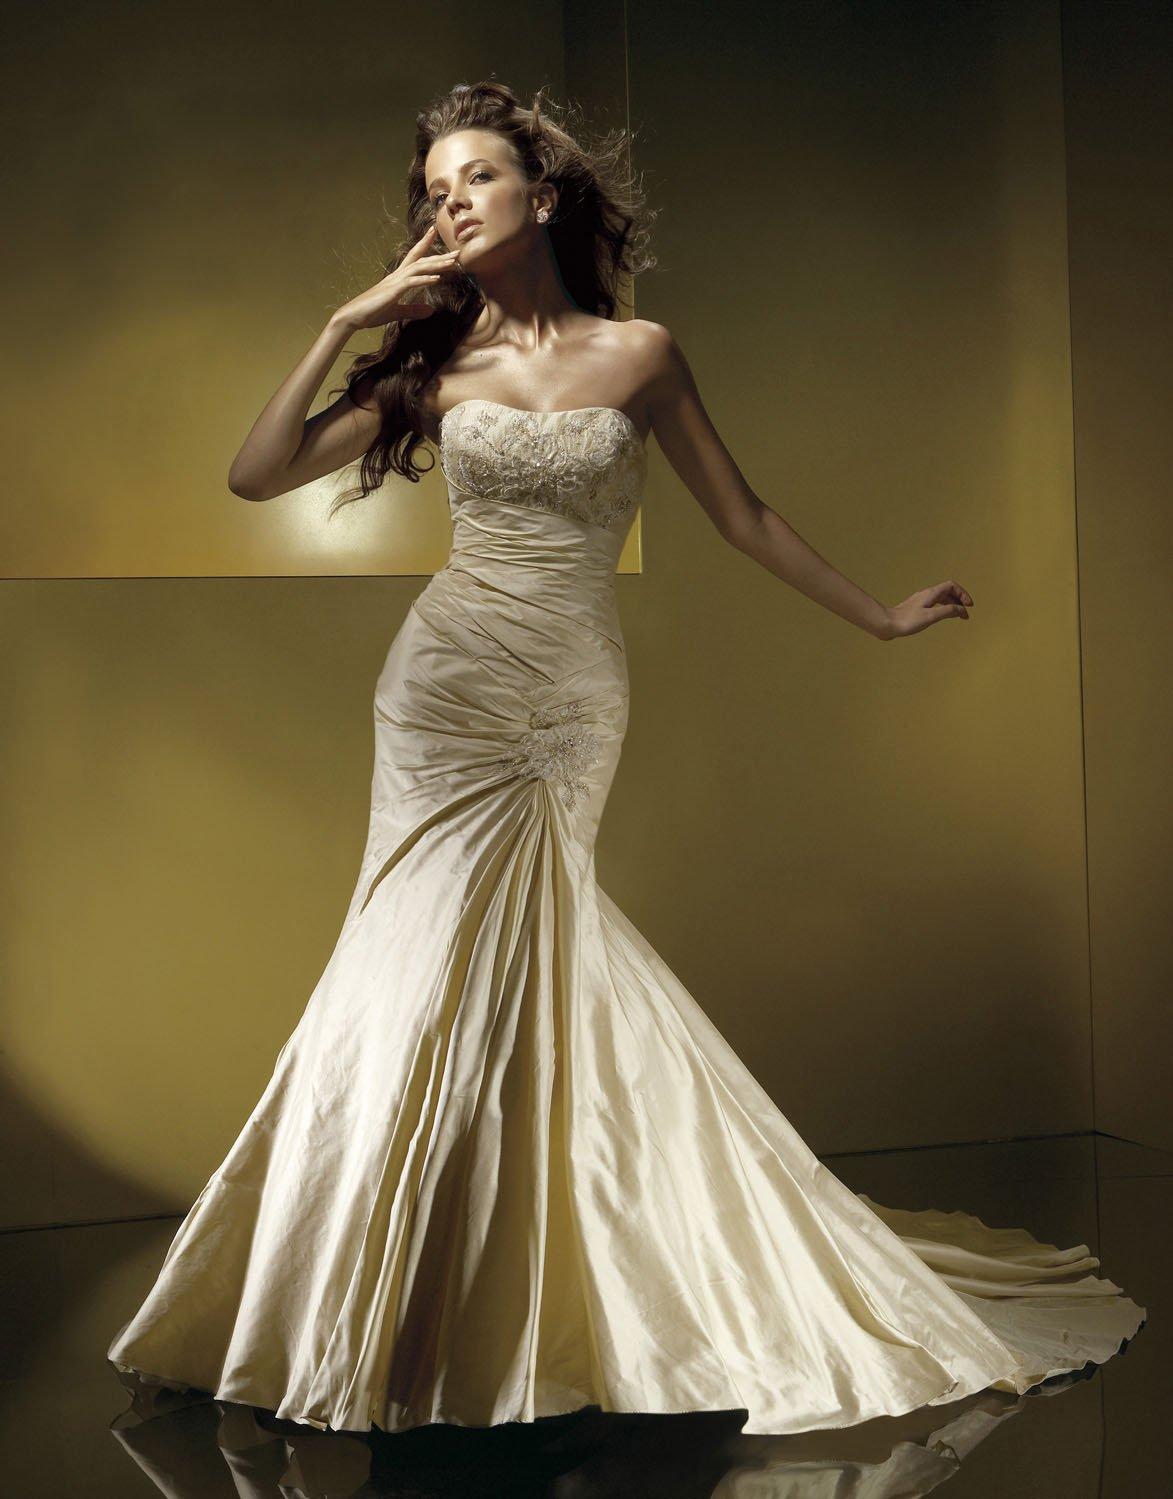 Mermaid Scoop Neckline Appliqued Beading Taffeta Wedding Dress Bridal Gown aq0030